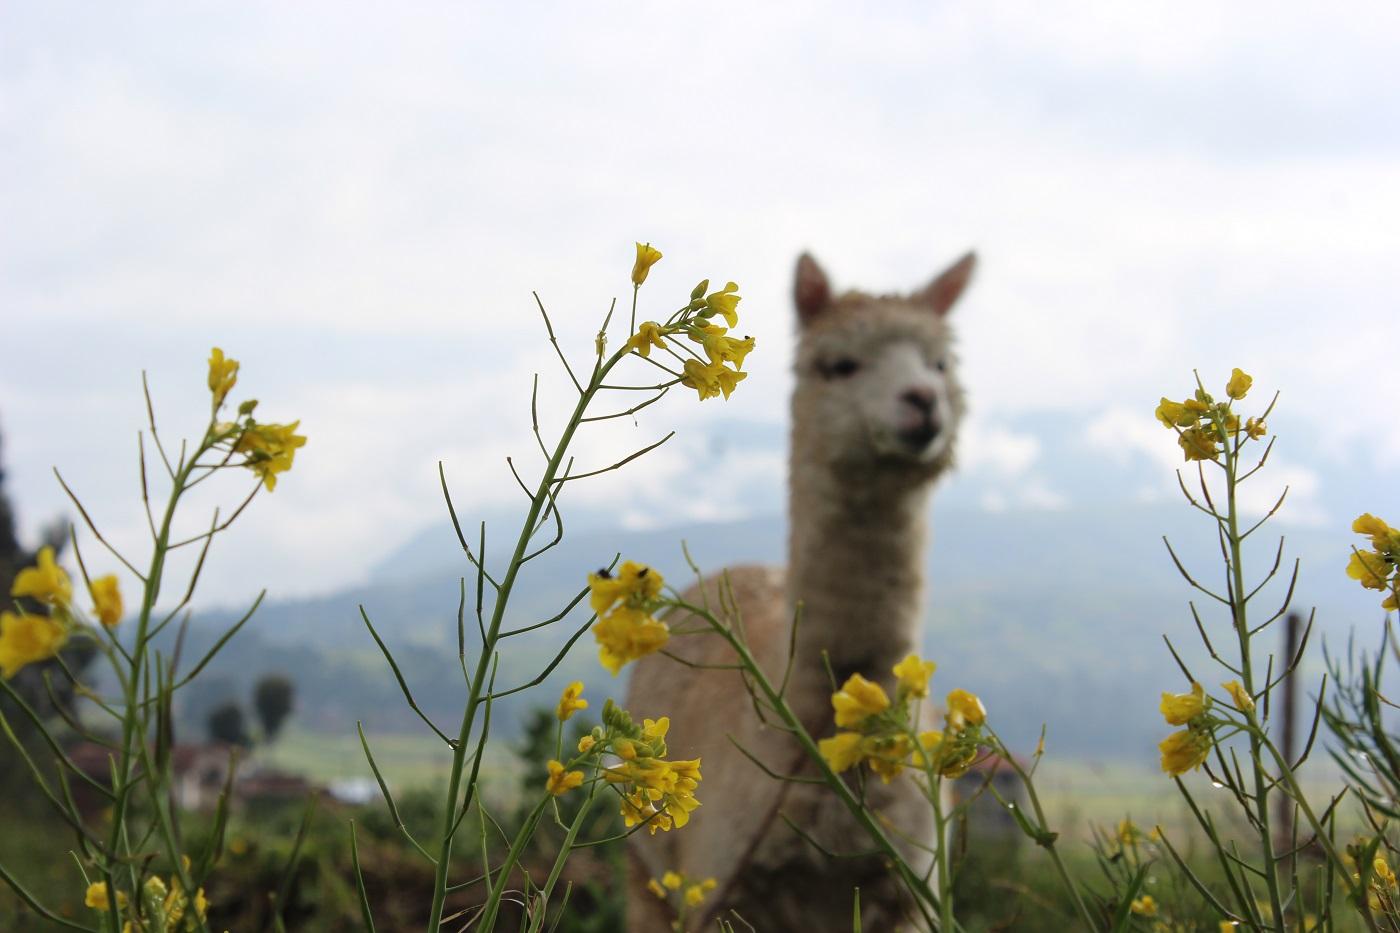 Chinchero (Foto: Tati Sisti)